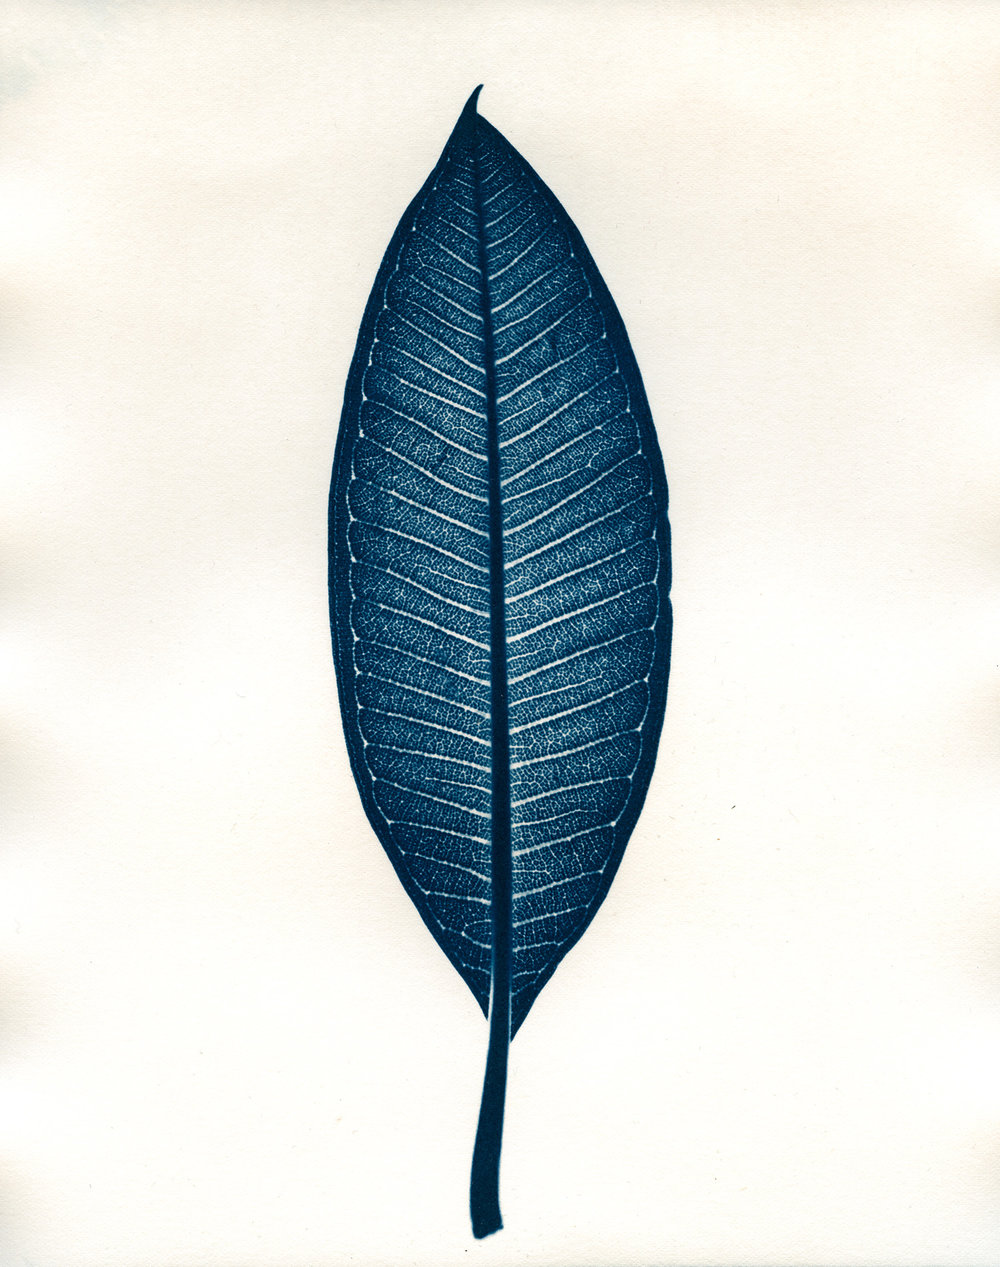 Cyan-Frangipani_Leaf-1900x1500x72dpi-Sq.jpg